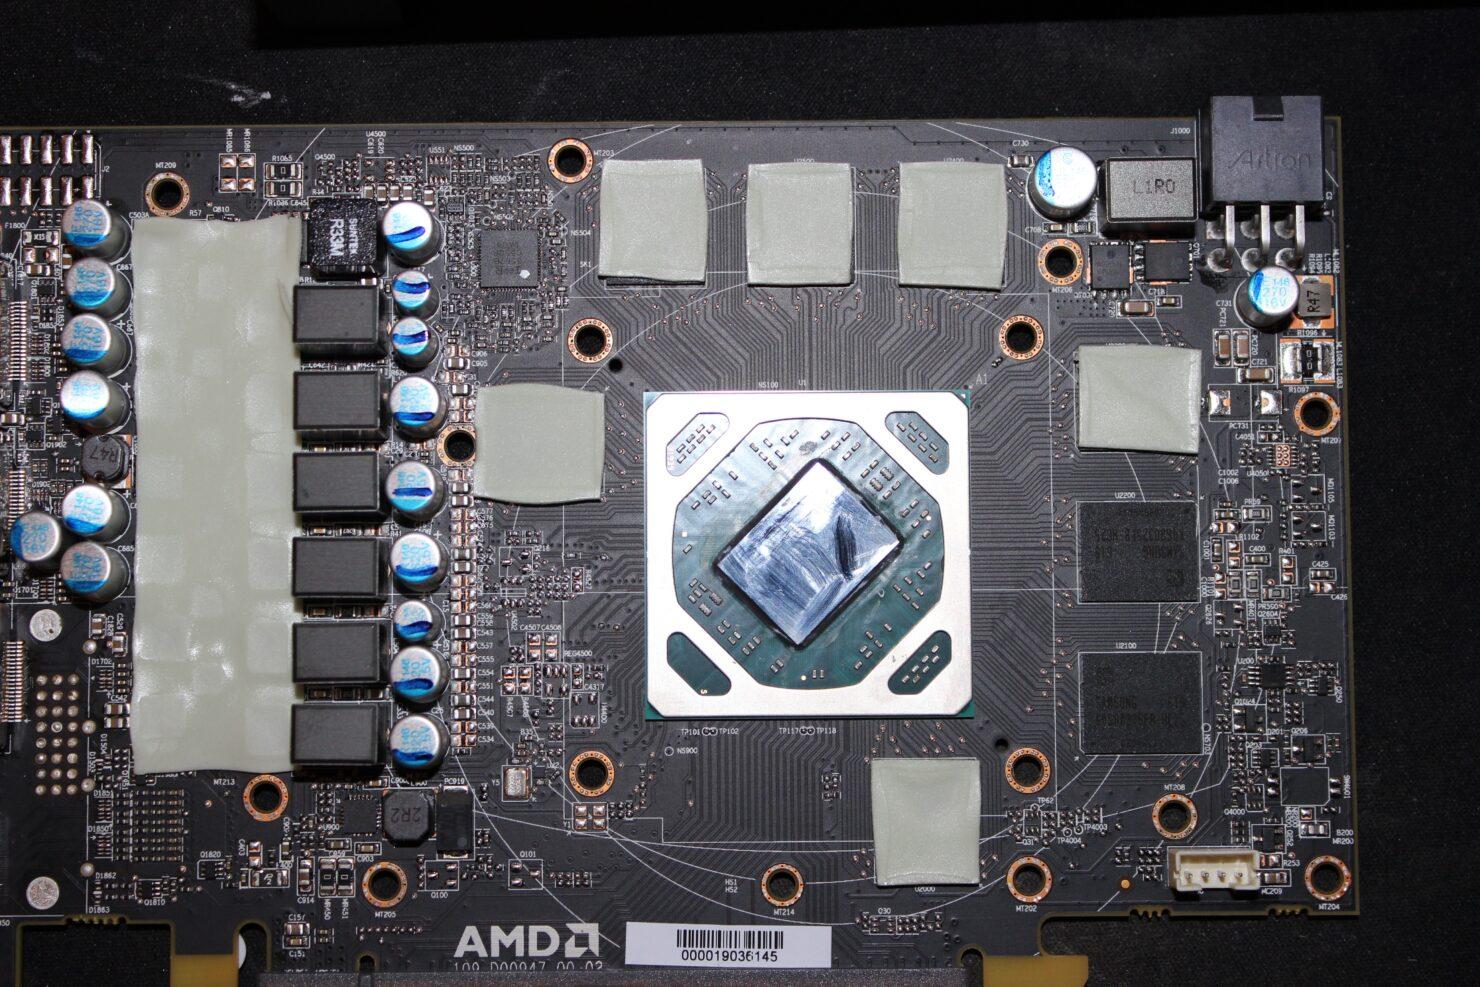 amd-radeon-rx-480-4gb-version-with-8gb-samsung-memory